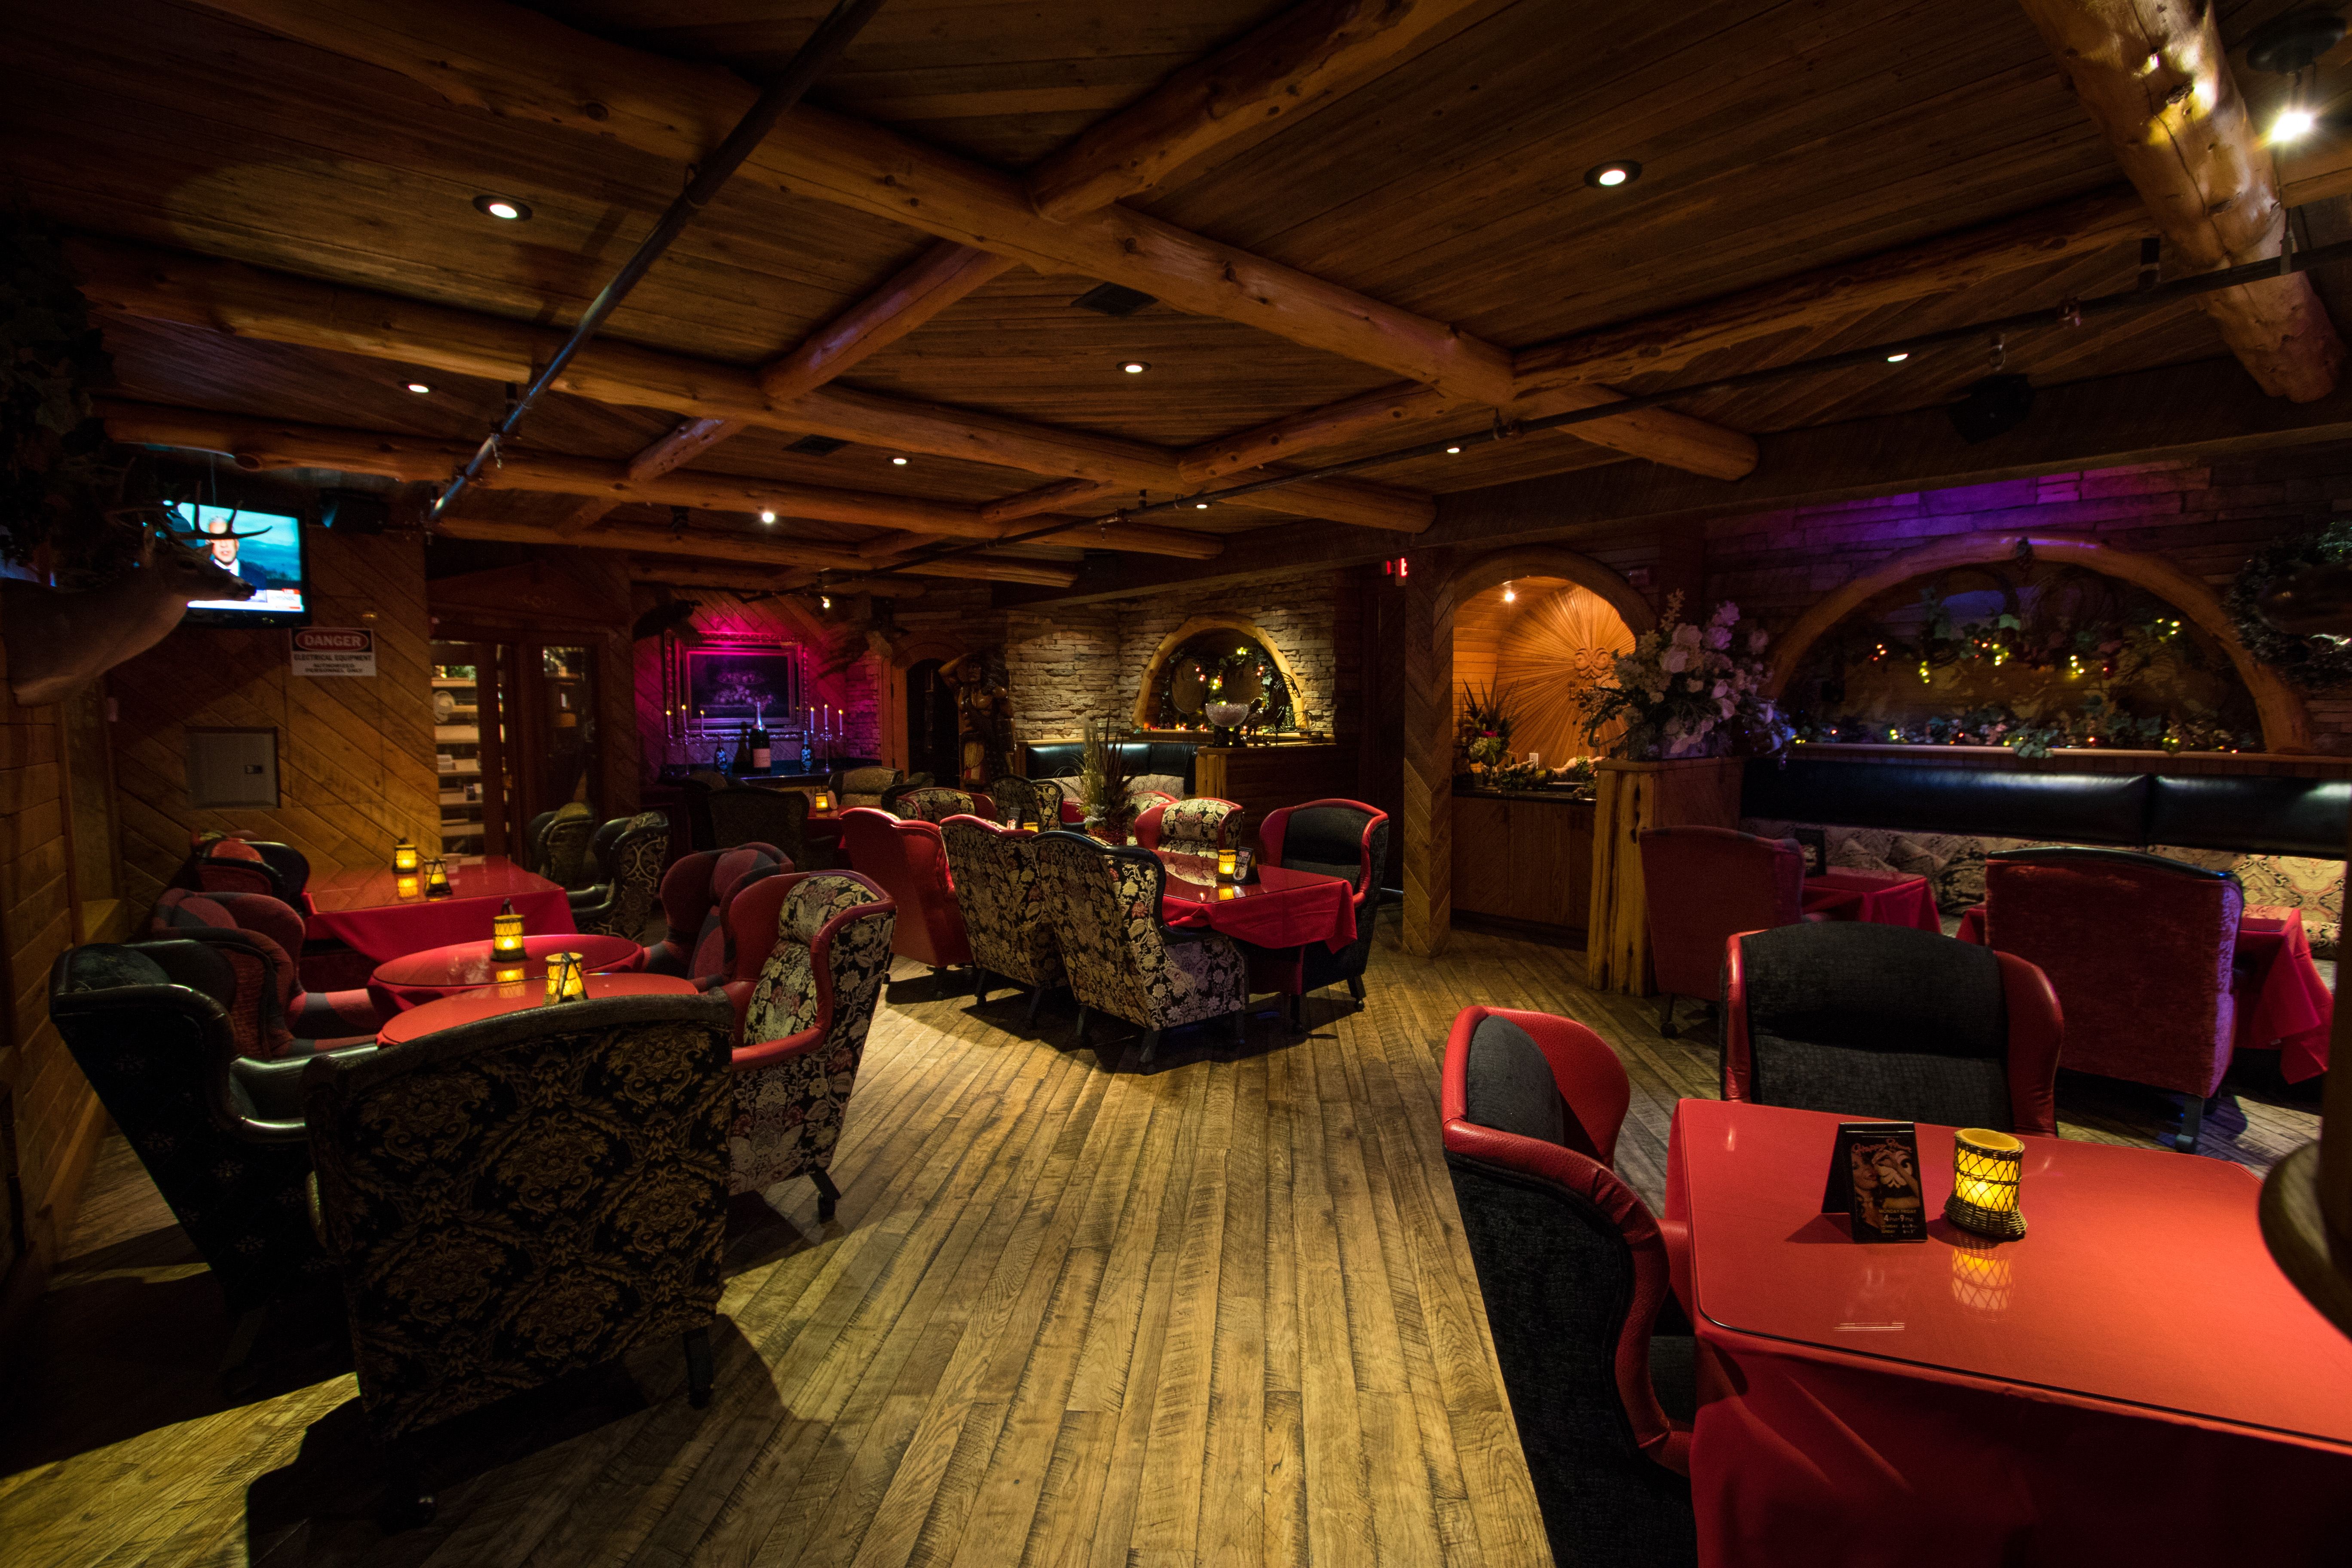 The Lodge Wine Cellar